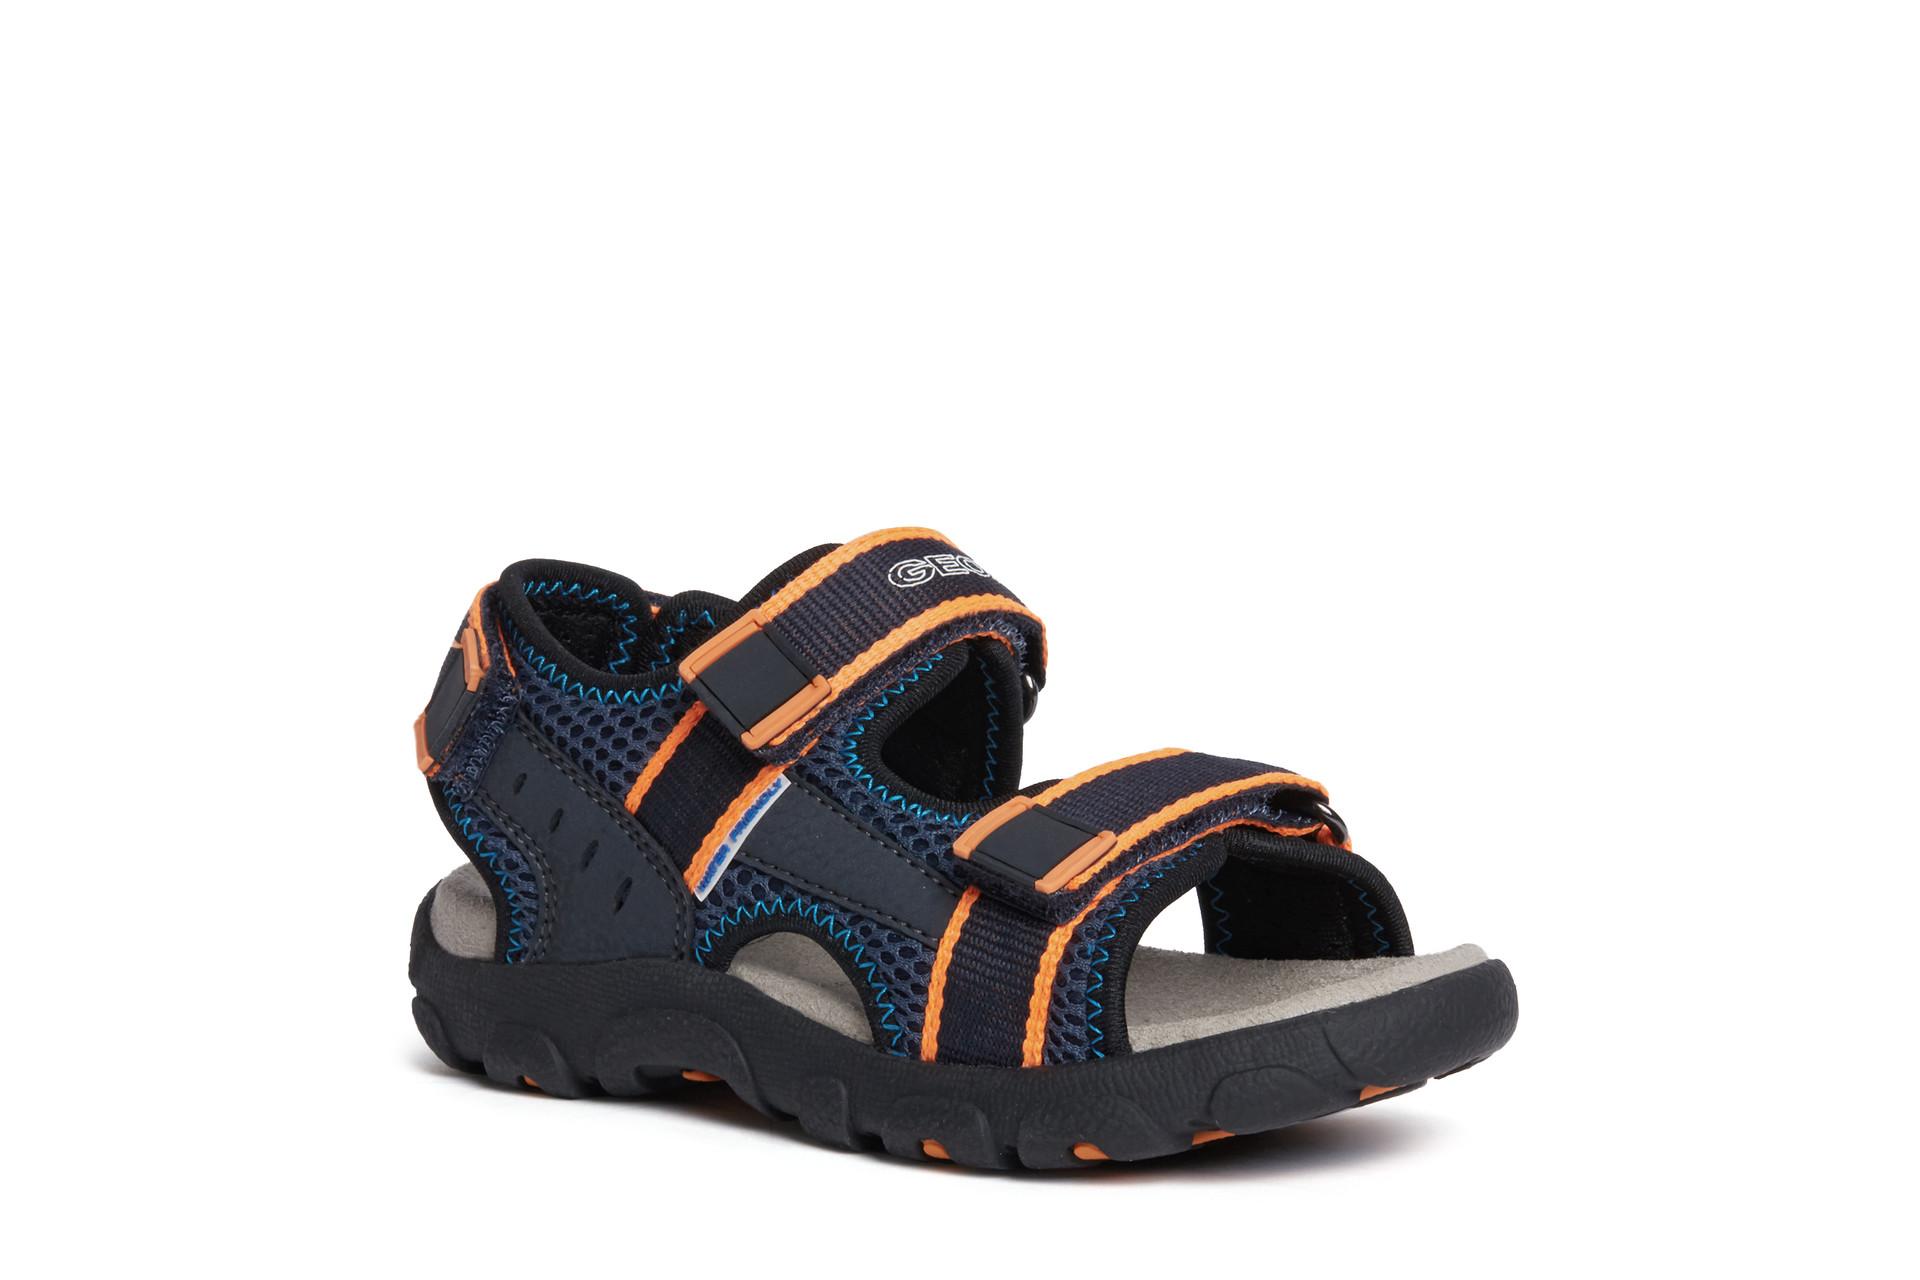 Sandale pour garçon Geox Strada J1524A navy/fluo orange